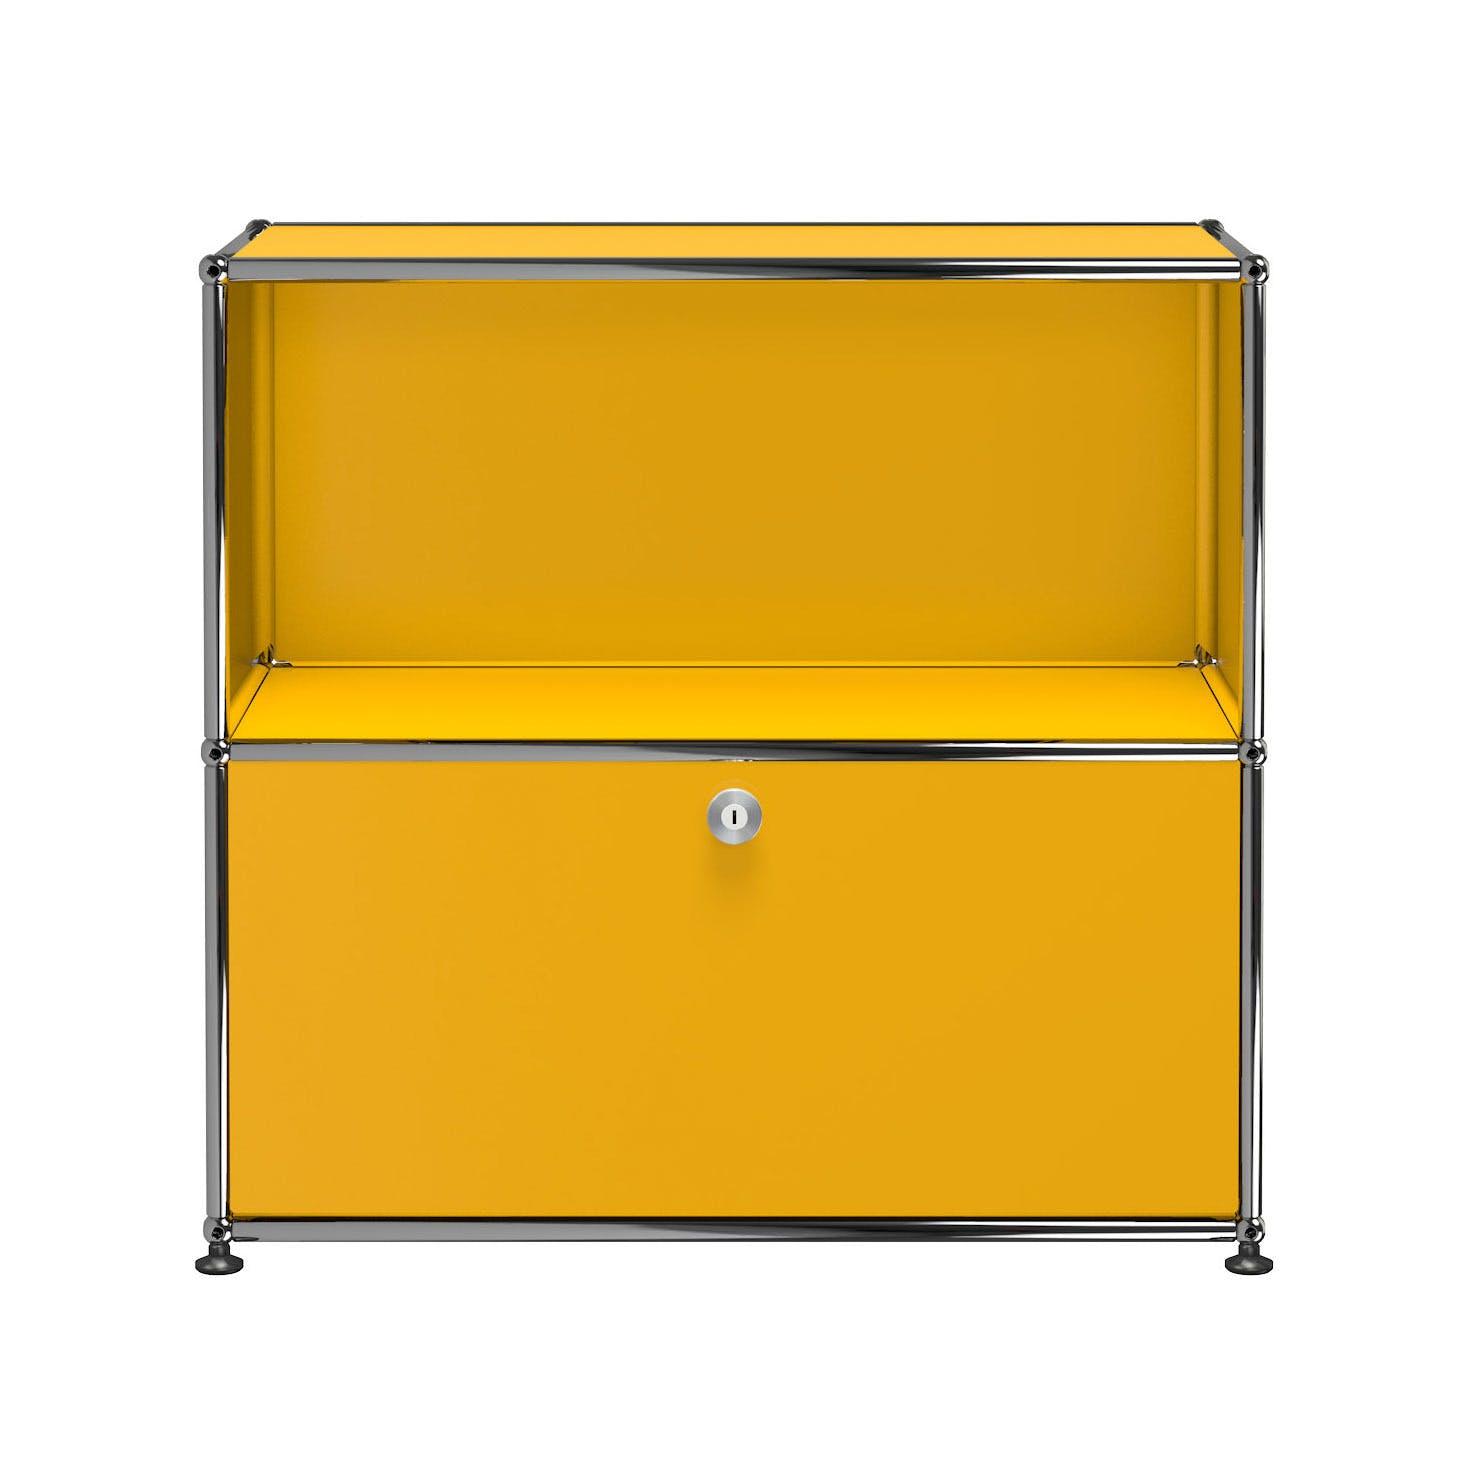 Usm-quick-ship-Haller-Storage-C1B-yellow-haute-living